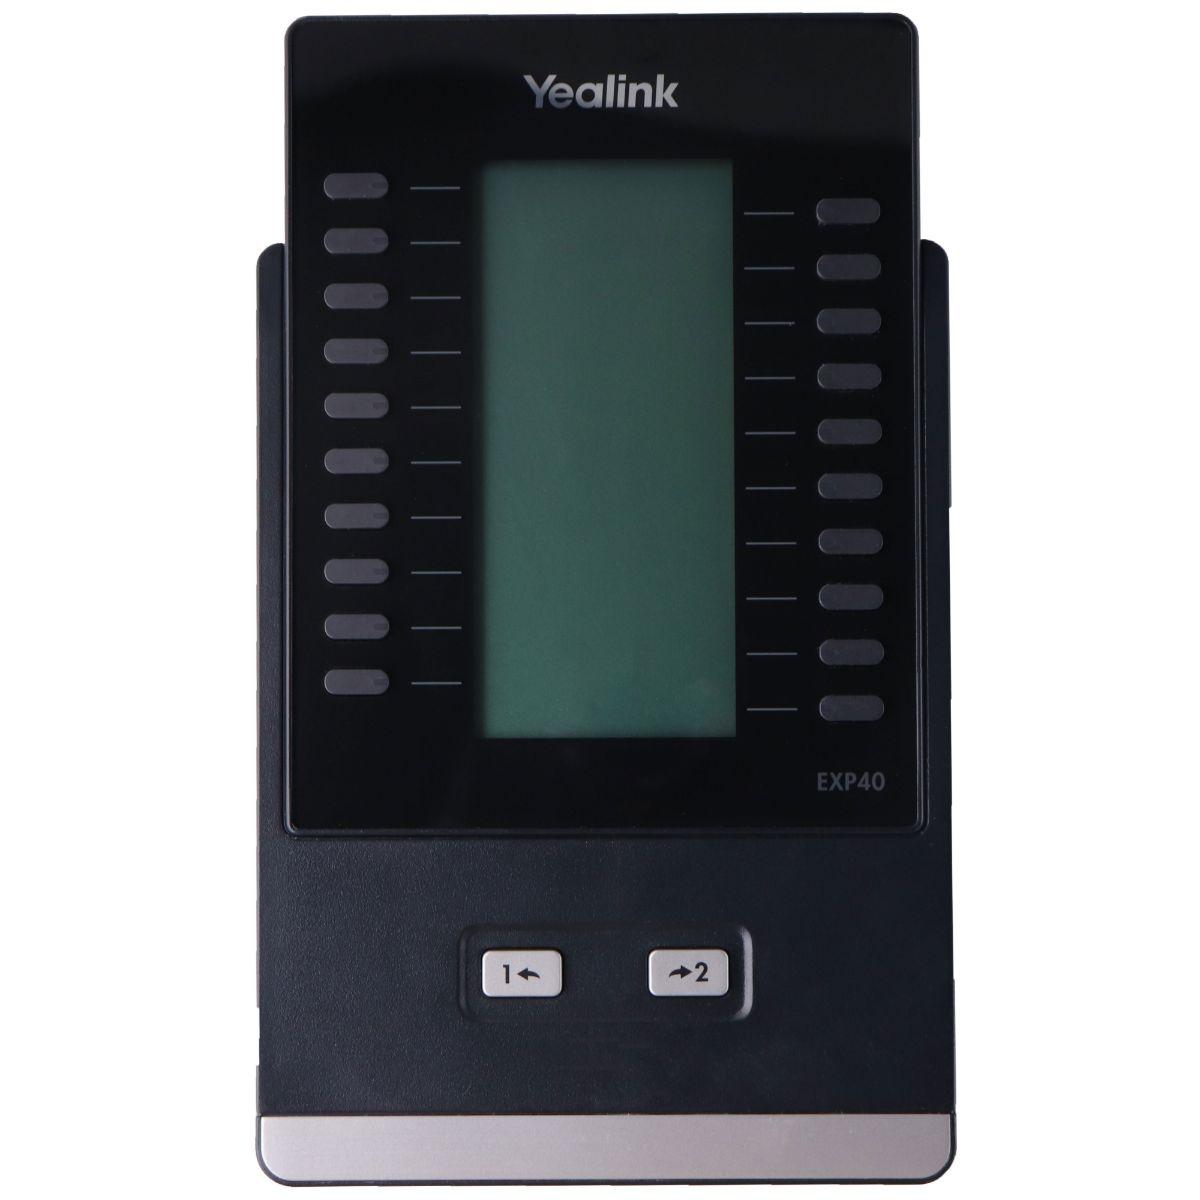 Yealink EXP40 - T4 series Expansion Module